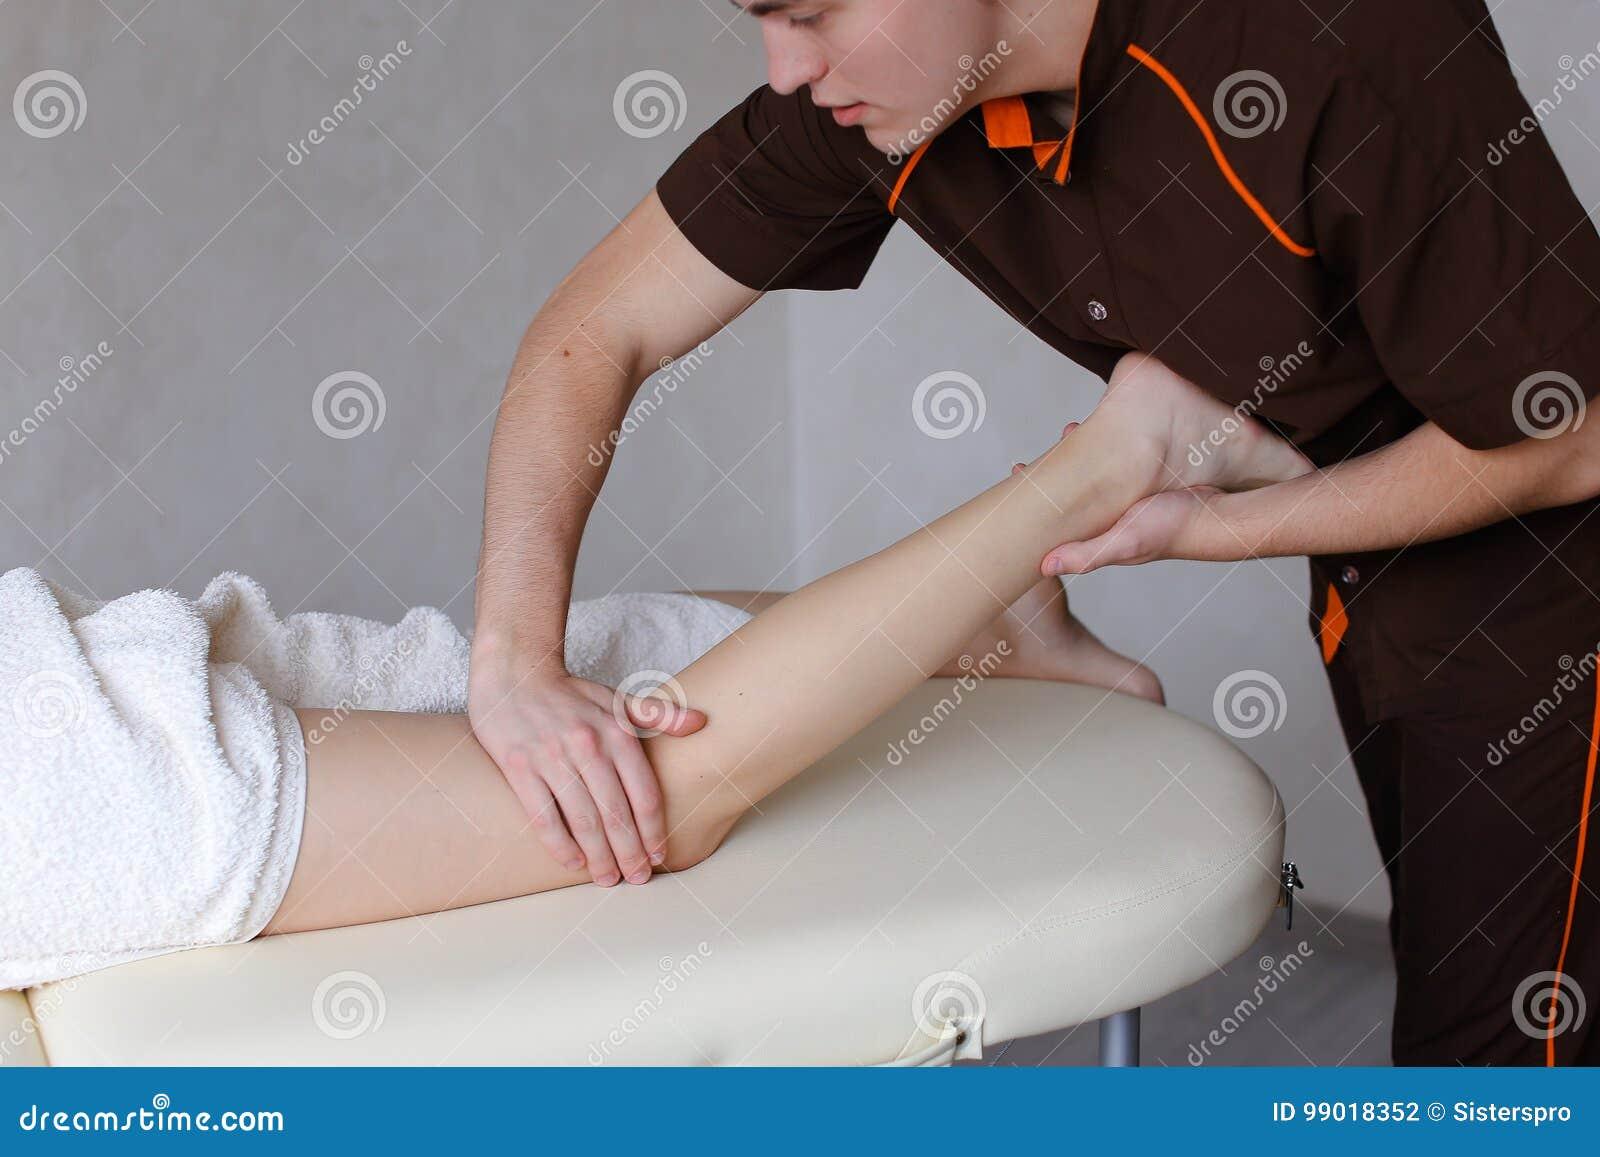 Массаж мужской девушкой секс массаж hd онлайн